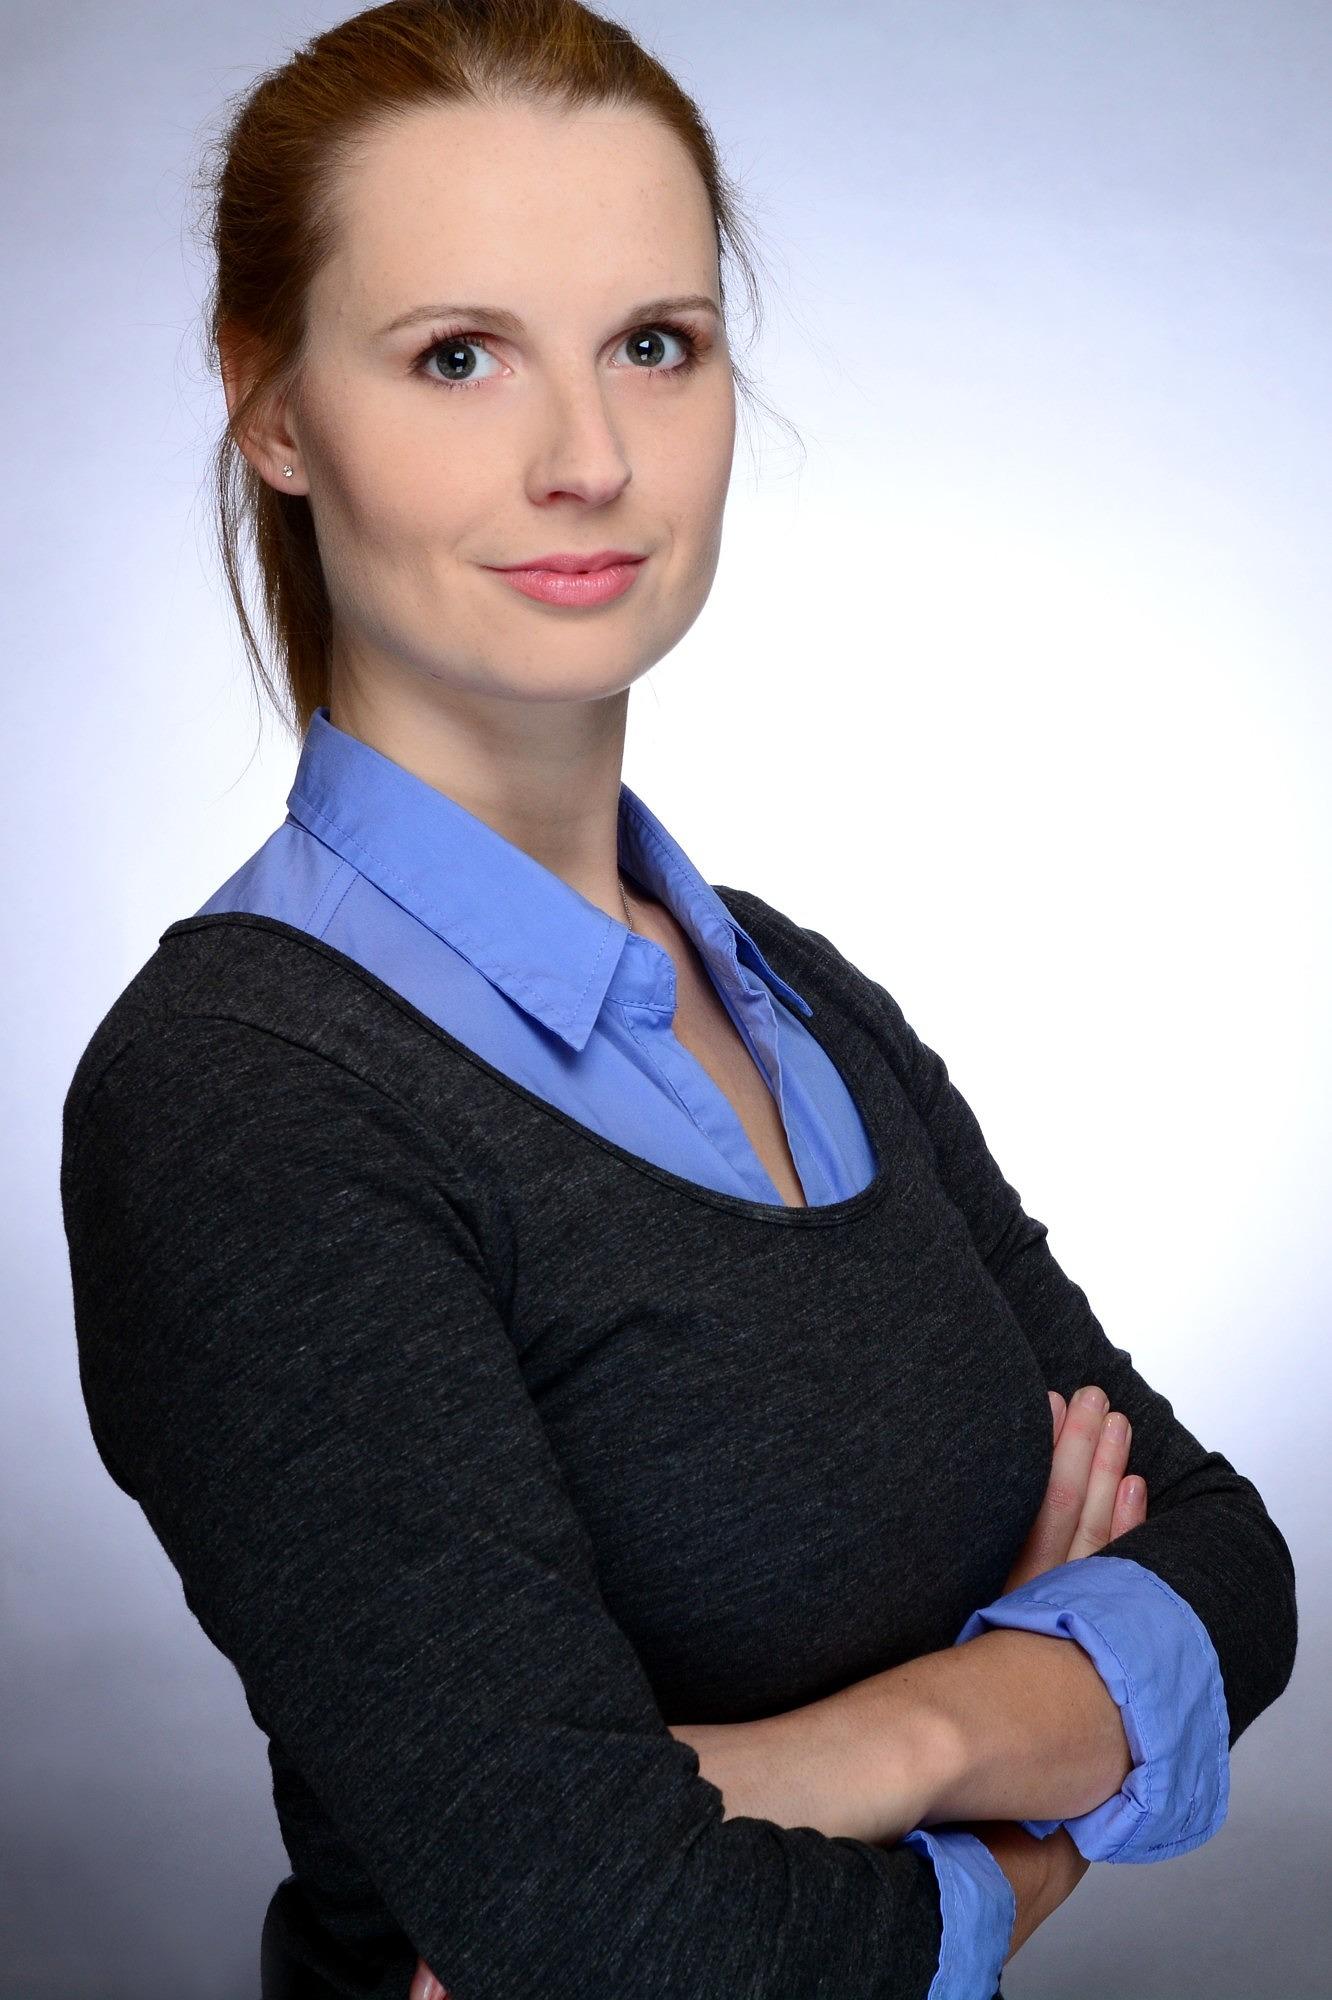 Anja Wunder